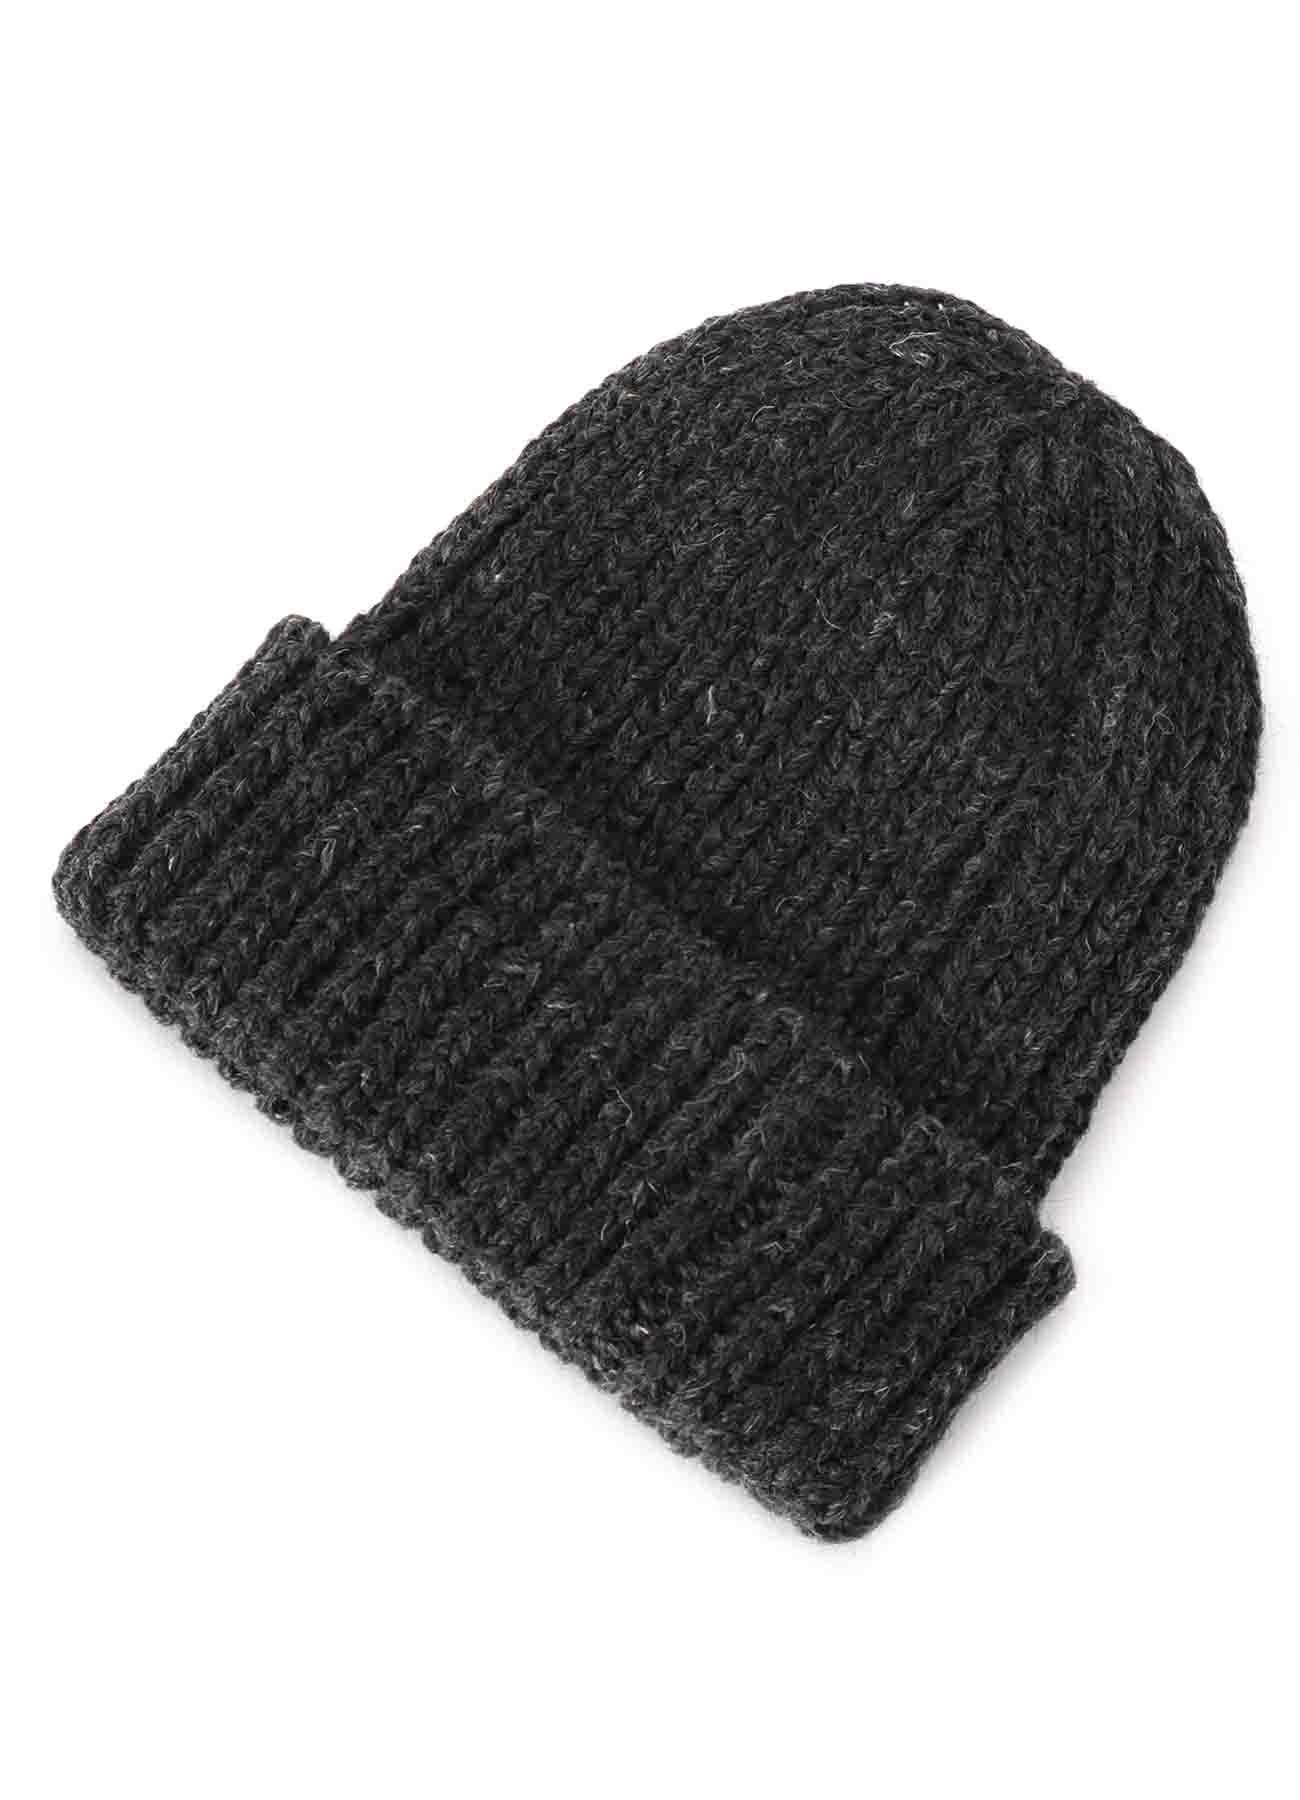 MIX/WOOL ACRYLIC FOLDED KNIT CAP